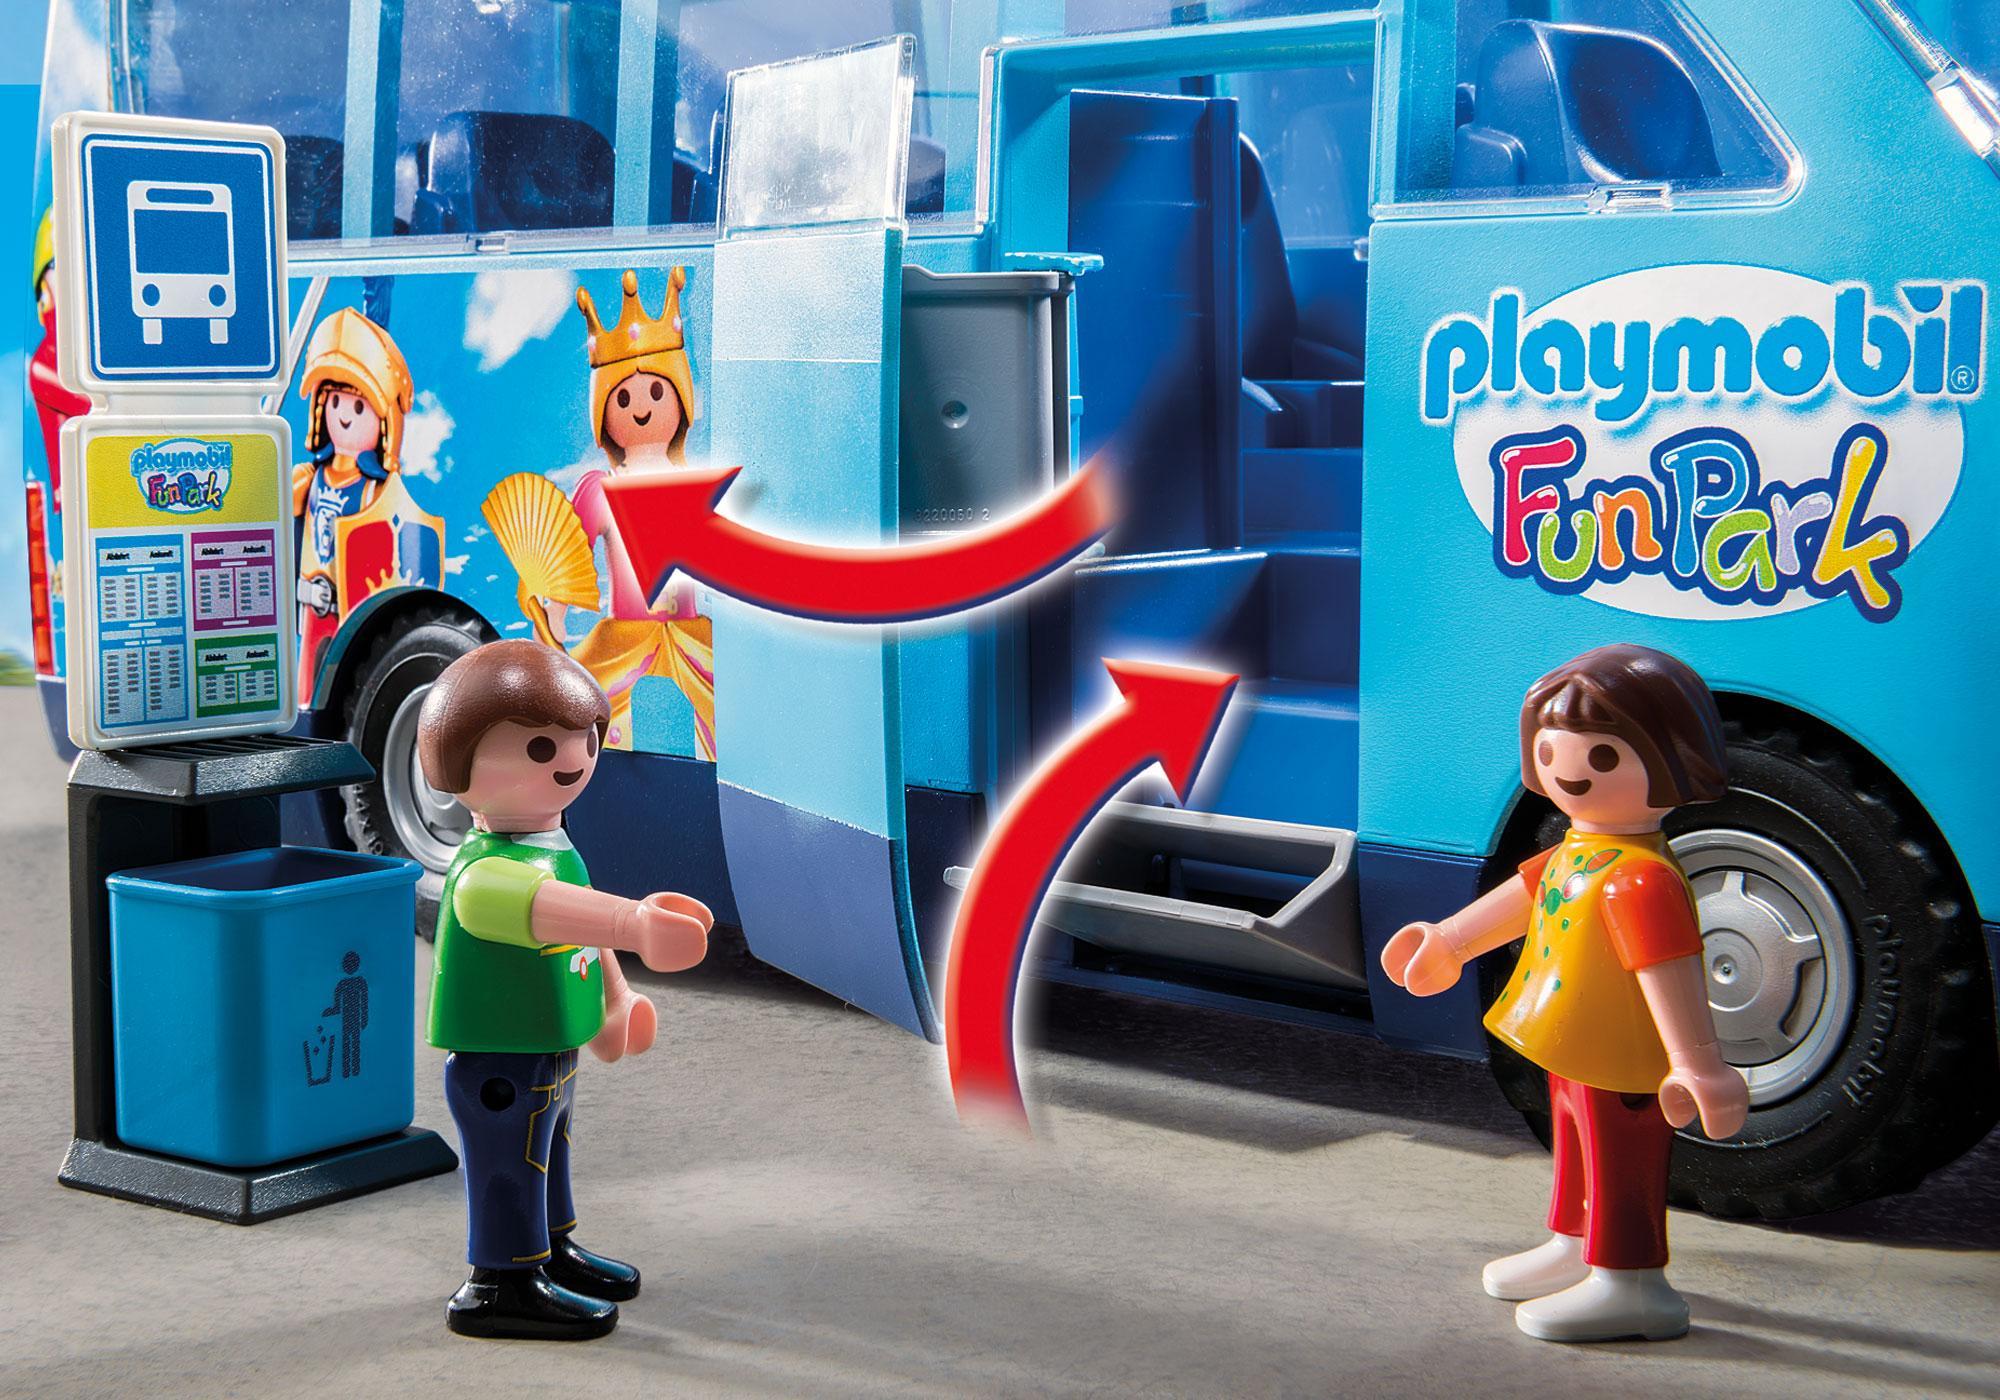 http://media.playmobil.com/i/playmobil/9117_product_extra1/PLAYMOBIL-FunPark Bus navetta